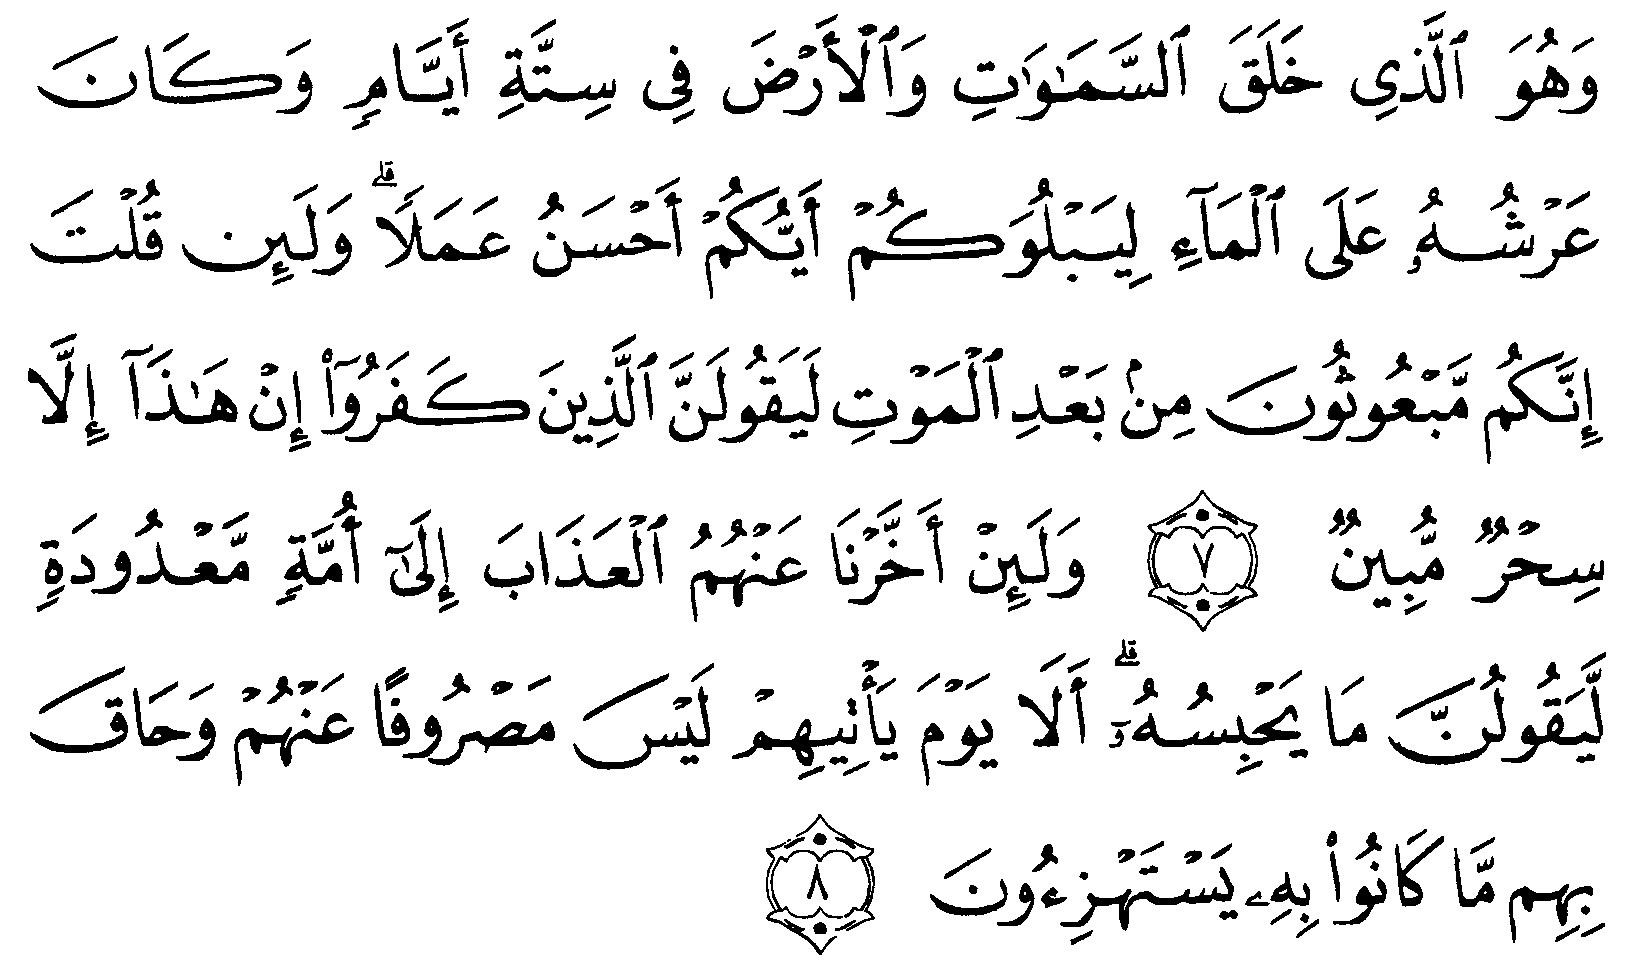 Tafsir Ibnu Katsir Surah Huud Ayat 7 8 Alquranmulia